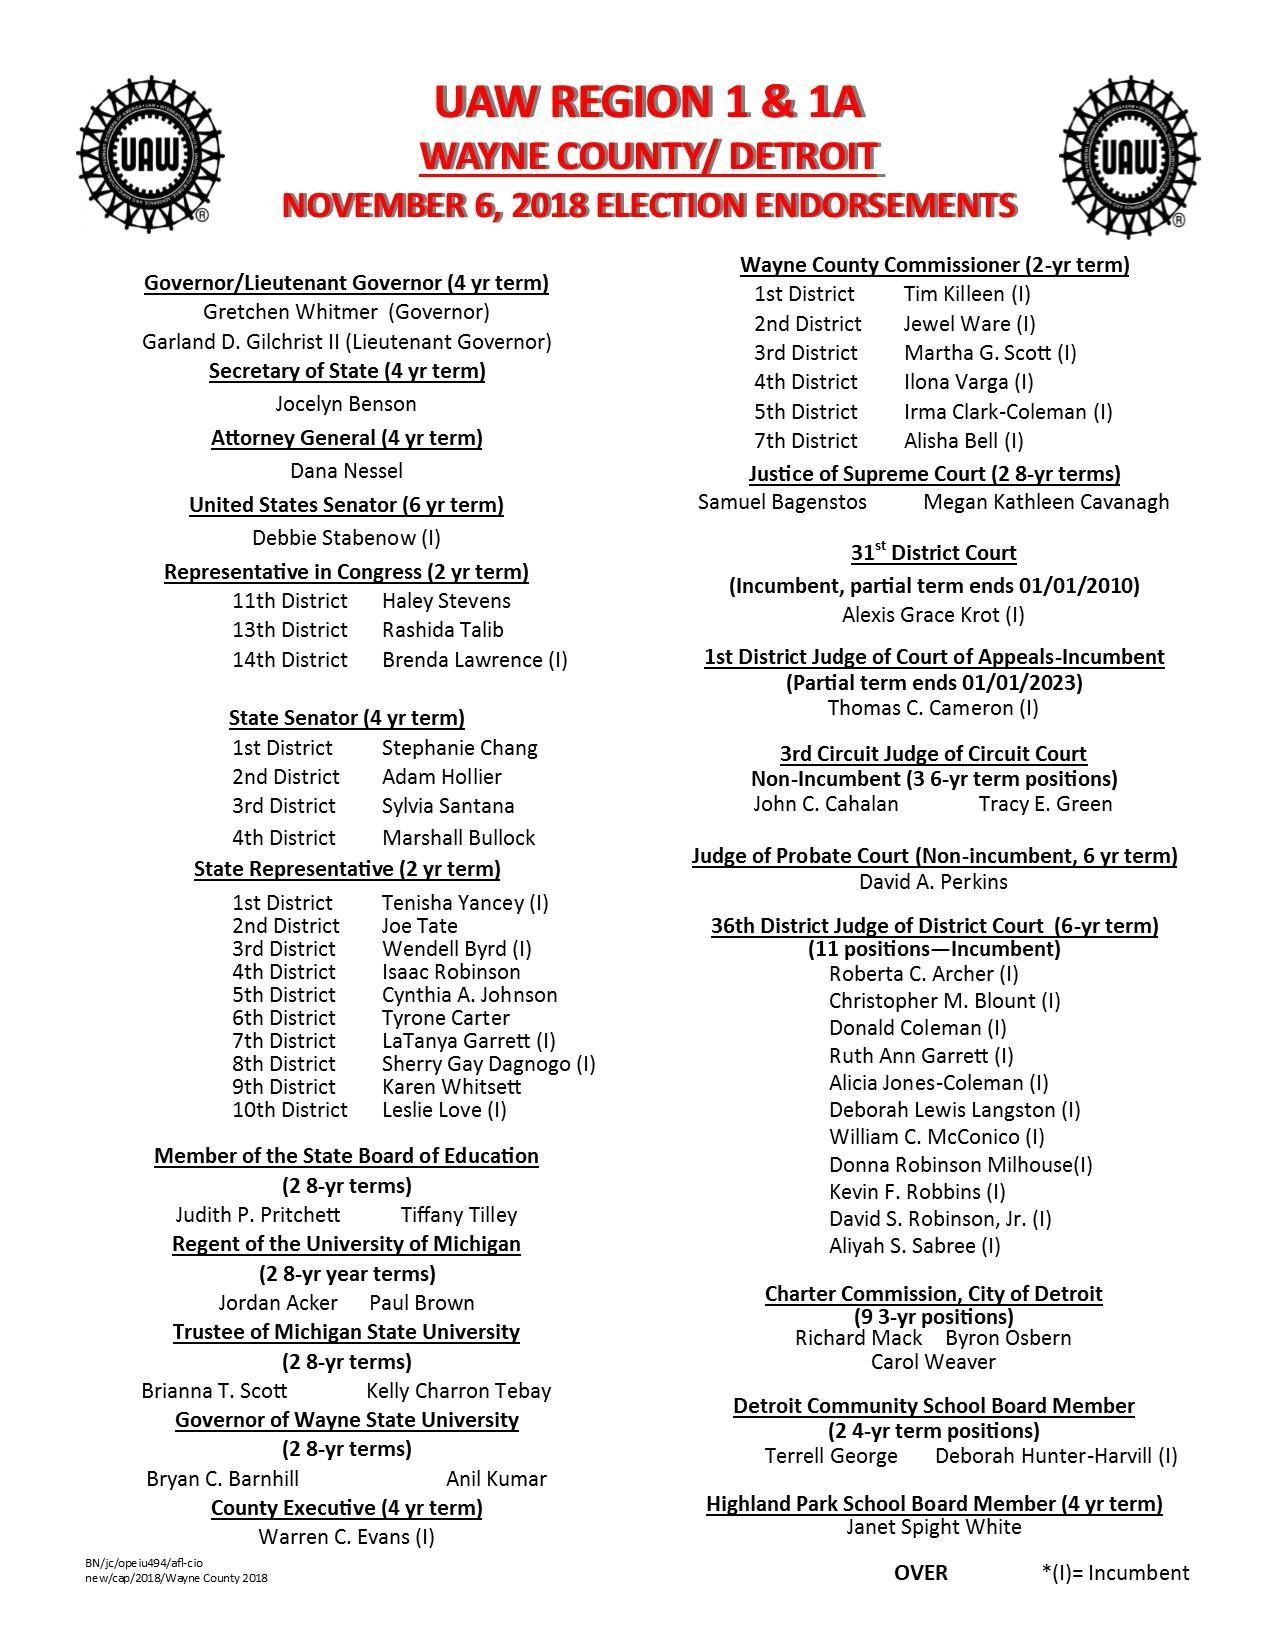 UAW Reg 1 & 1A Wayne County/Detroit Endorsements | Local 140 News